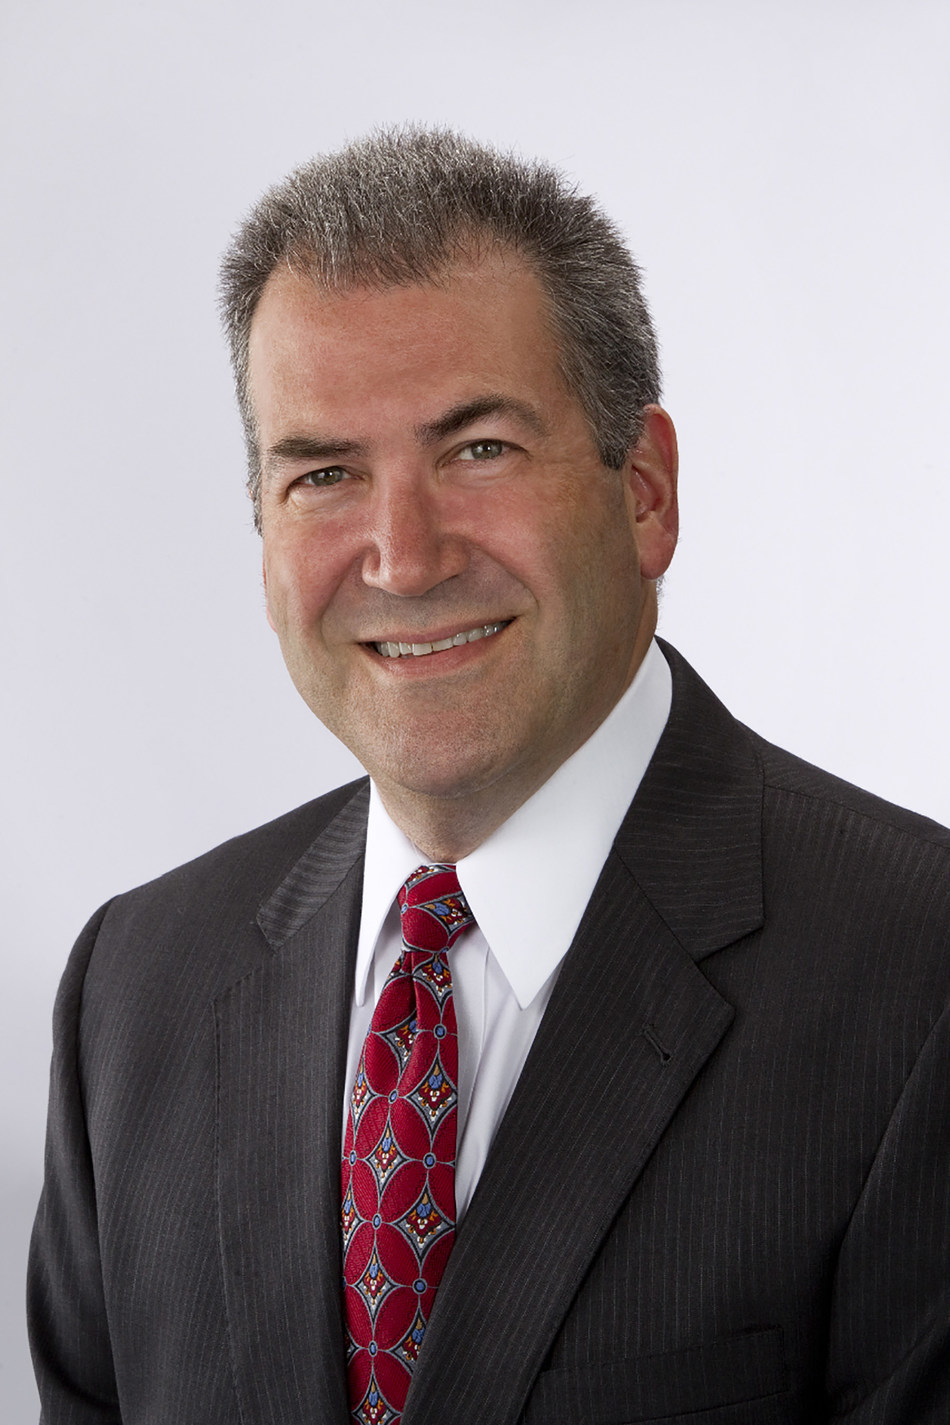 Jon Dishell, Chief Business Development Officer, Gemini Rosemont Commercial Real Estate